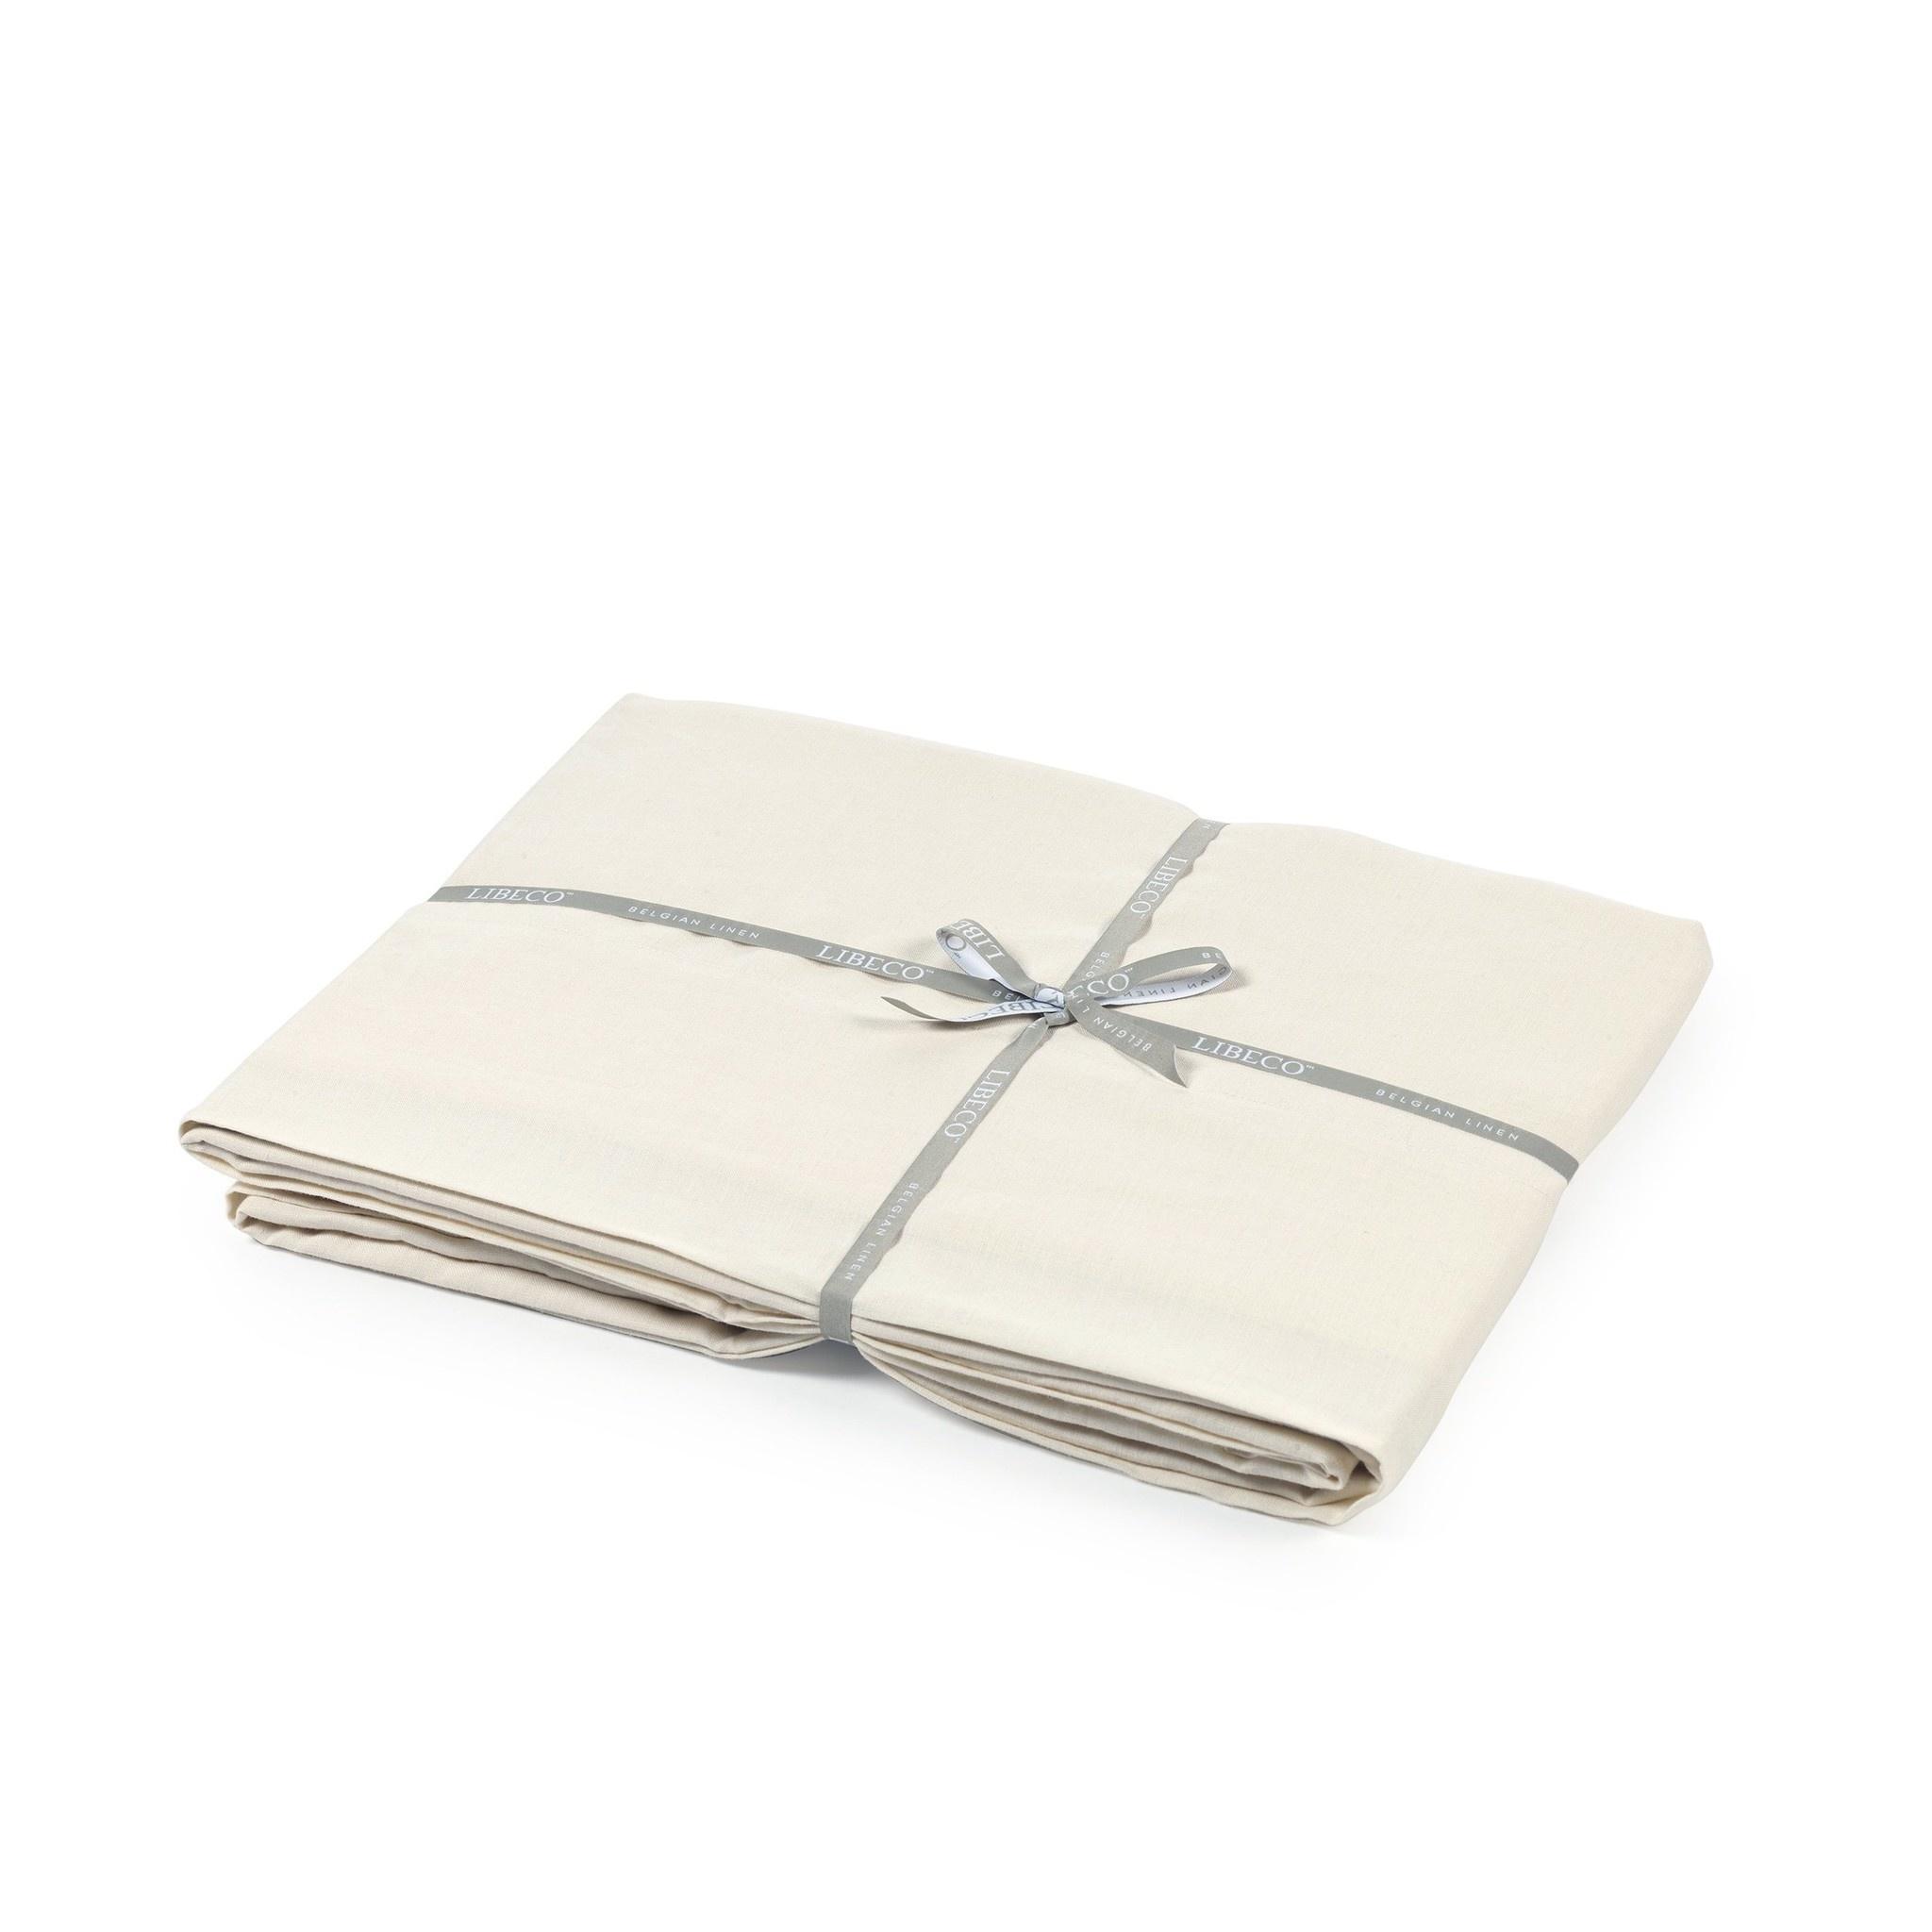 Flat Sheet/2 pillowshams - Santiago - Oyster - King-1